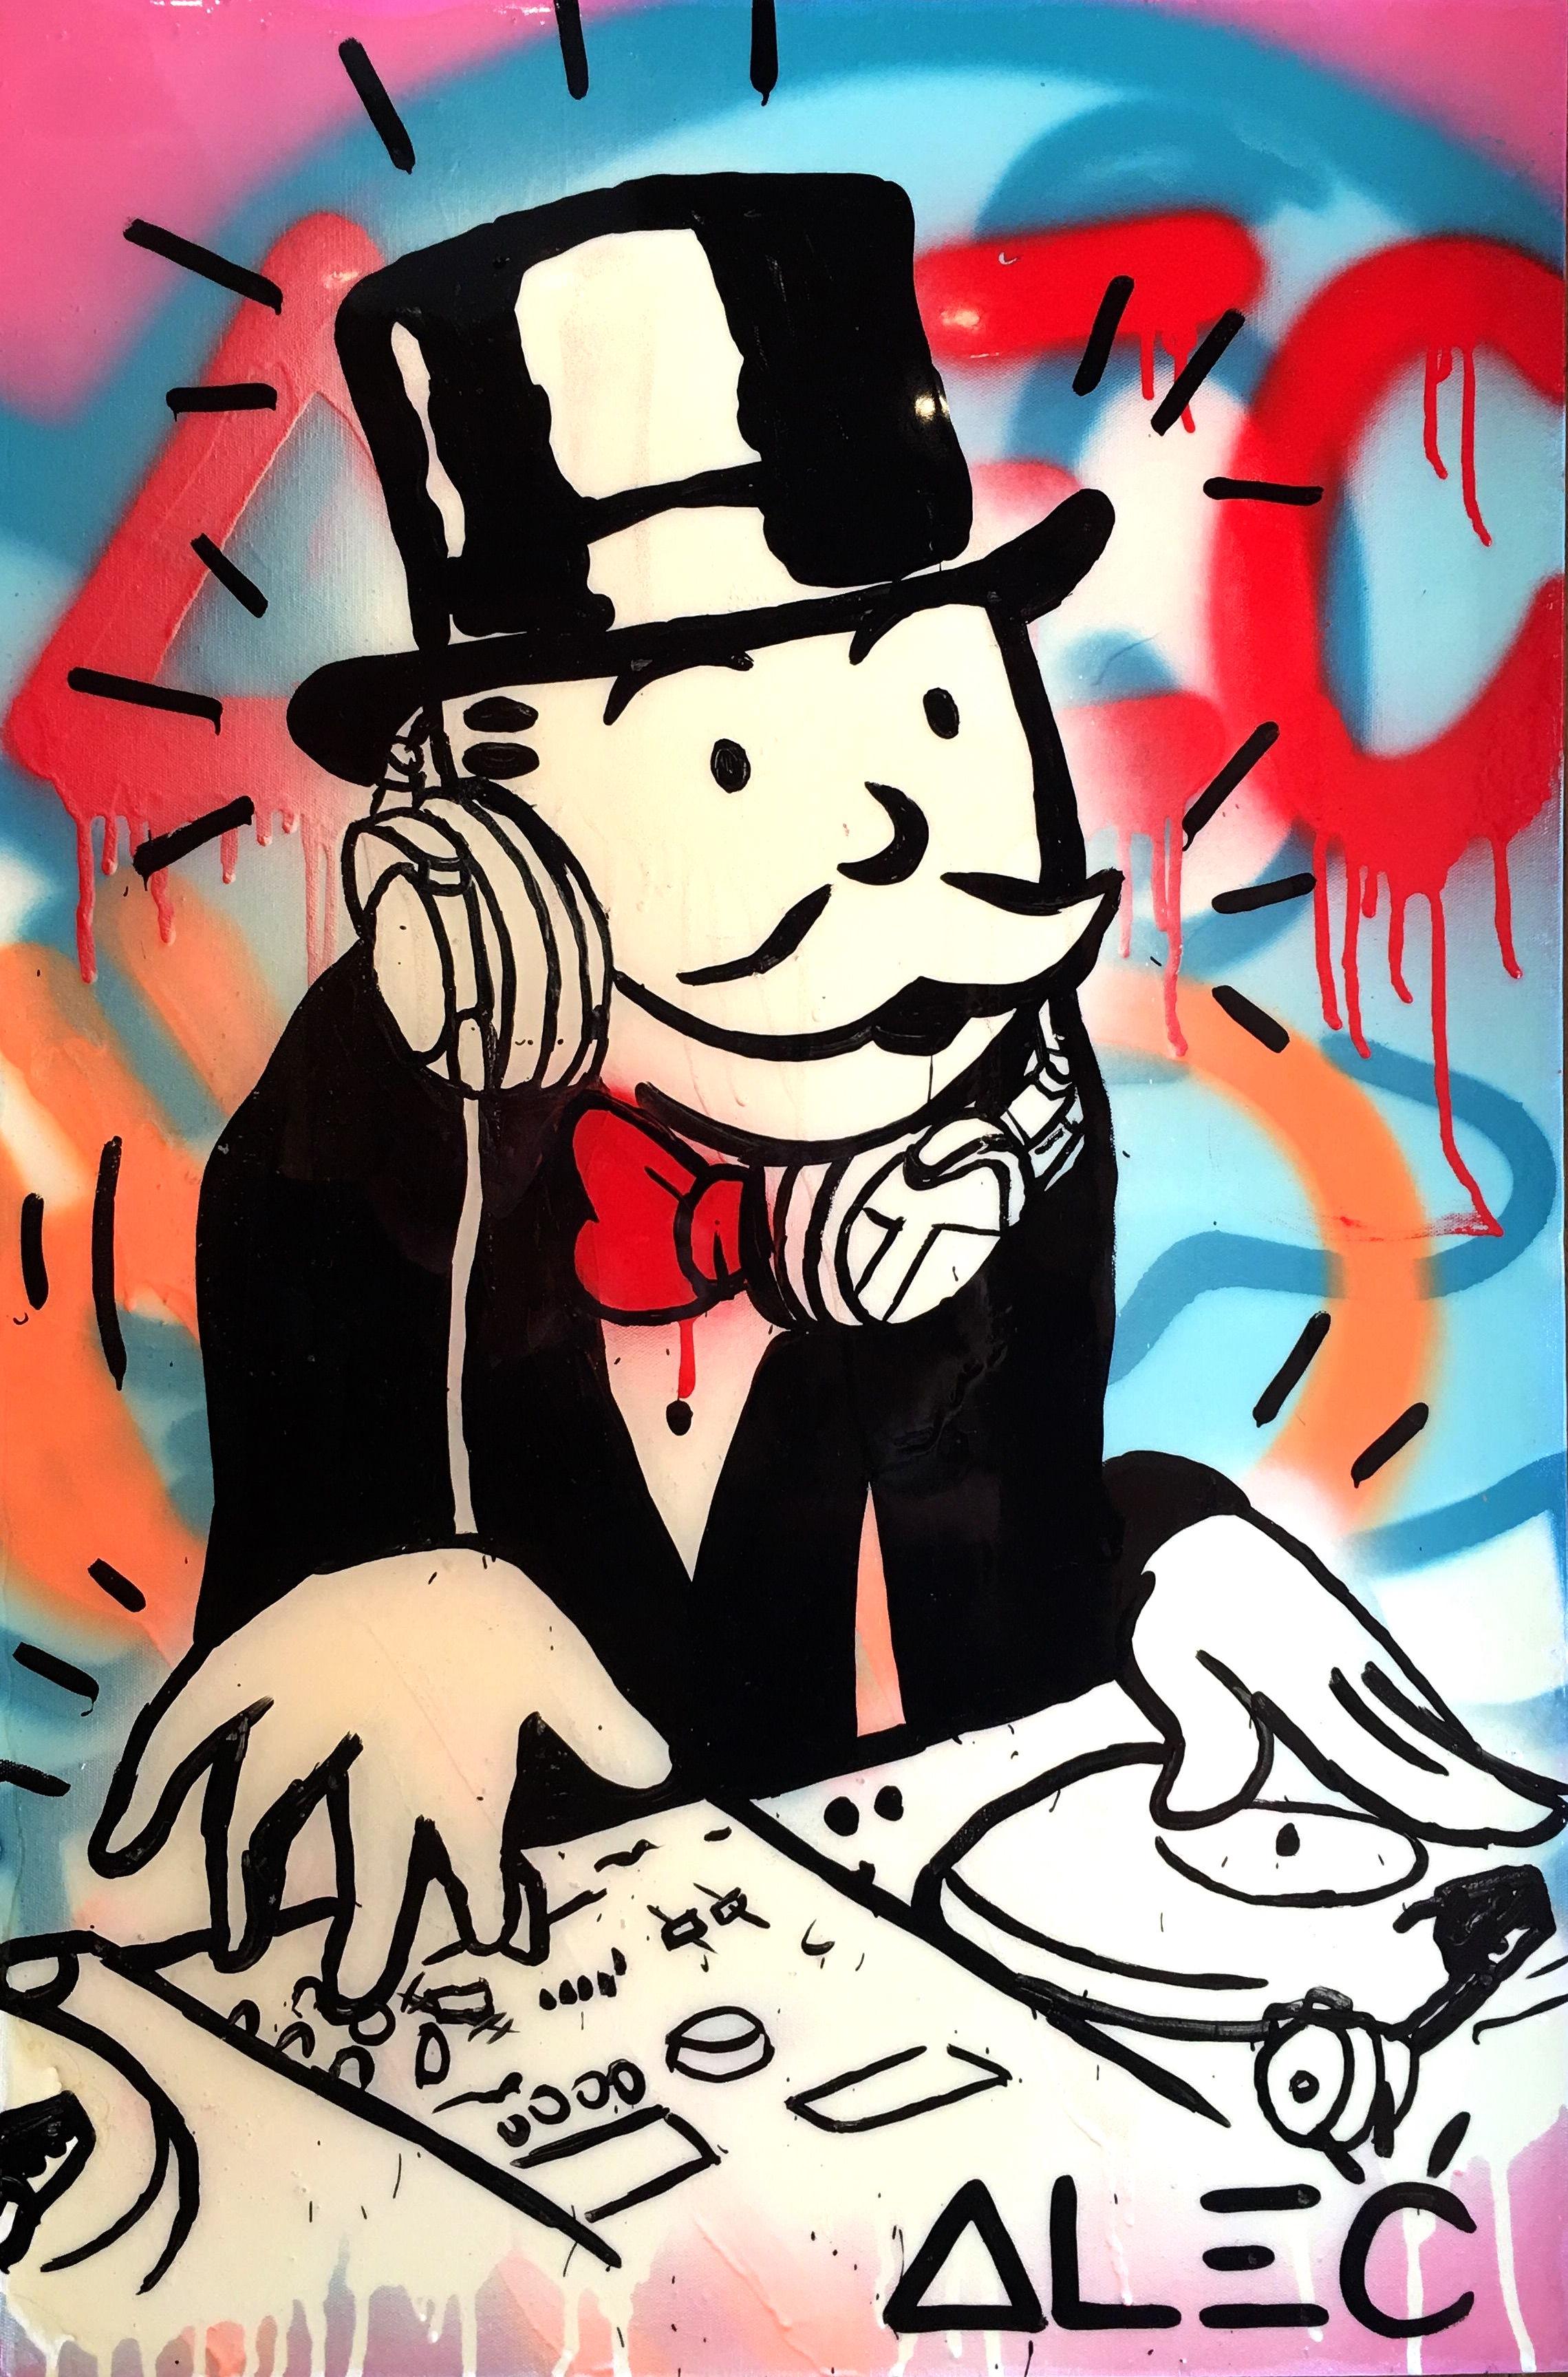 DJ Monopoly color by Alec Monopoly